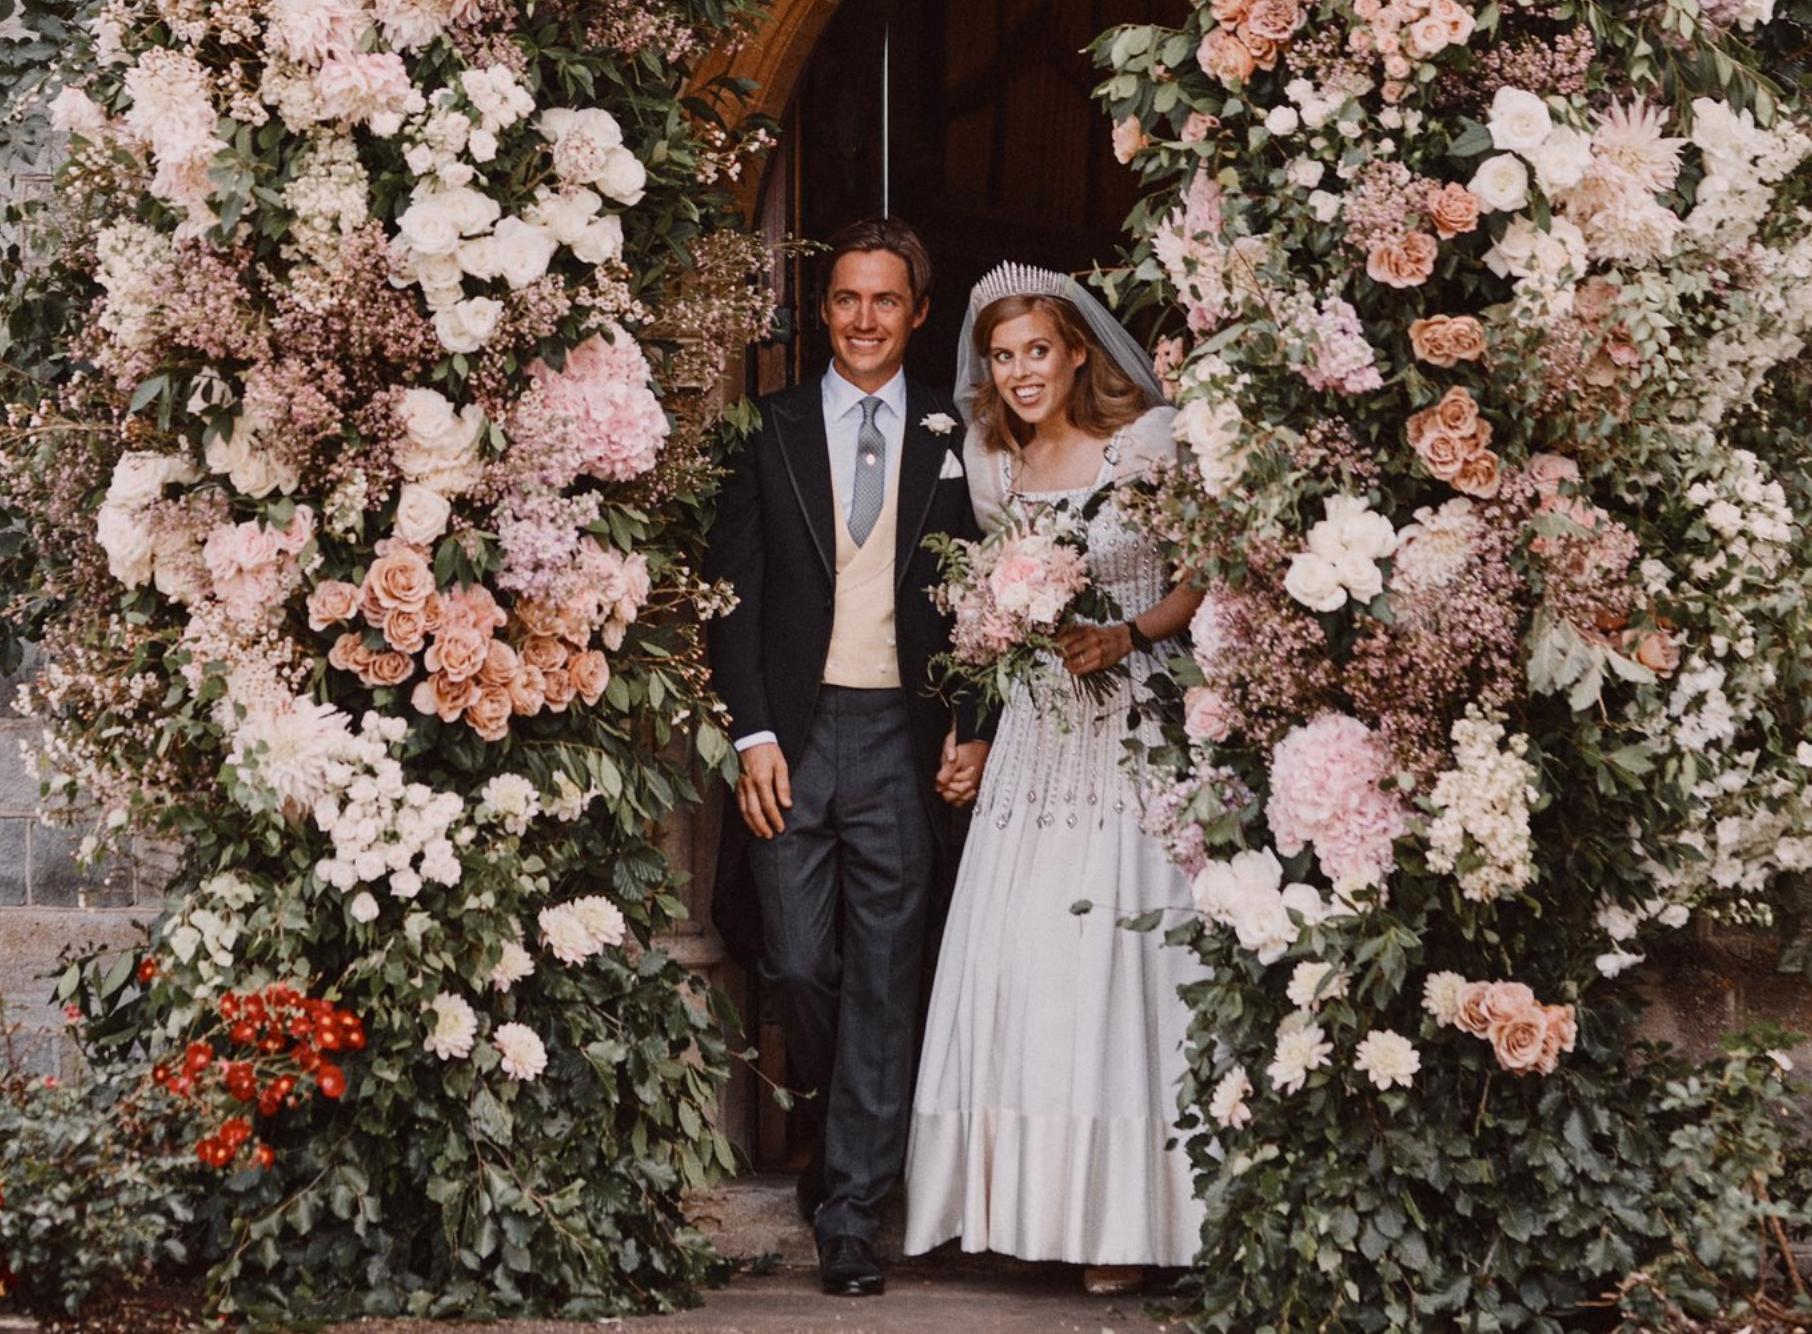 "<p>Принцесса Беатрис и её муж Эдоардо Мапелли-Моцци. Фото © Twitter / <a href=""https://twitter.com/RoyalFamily"" target=""_blank"" rel=""noopener noreferrer"">The Royal Family</a></p>"